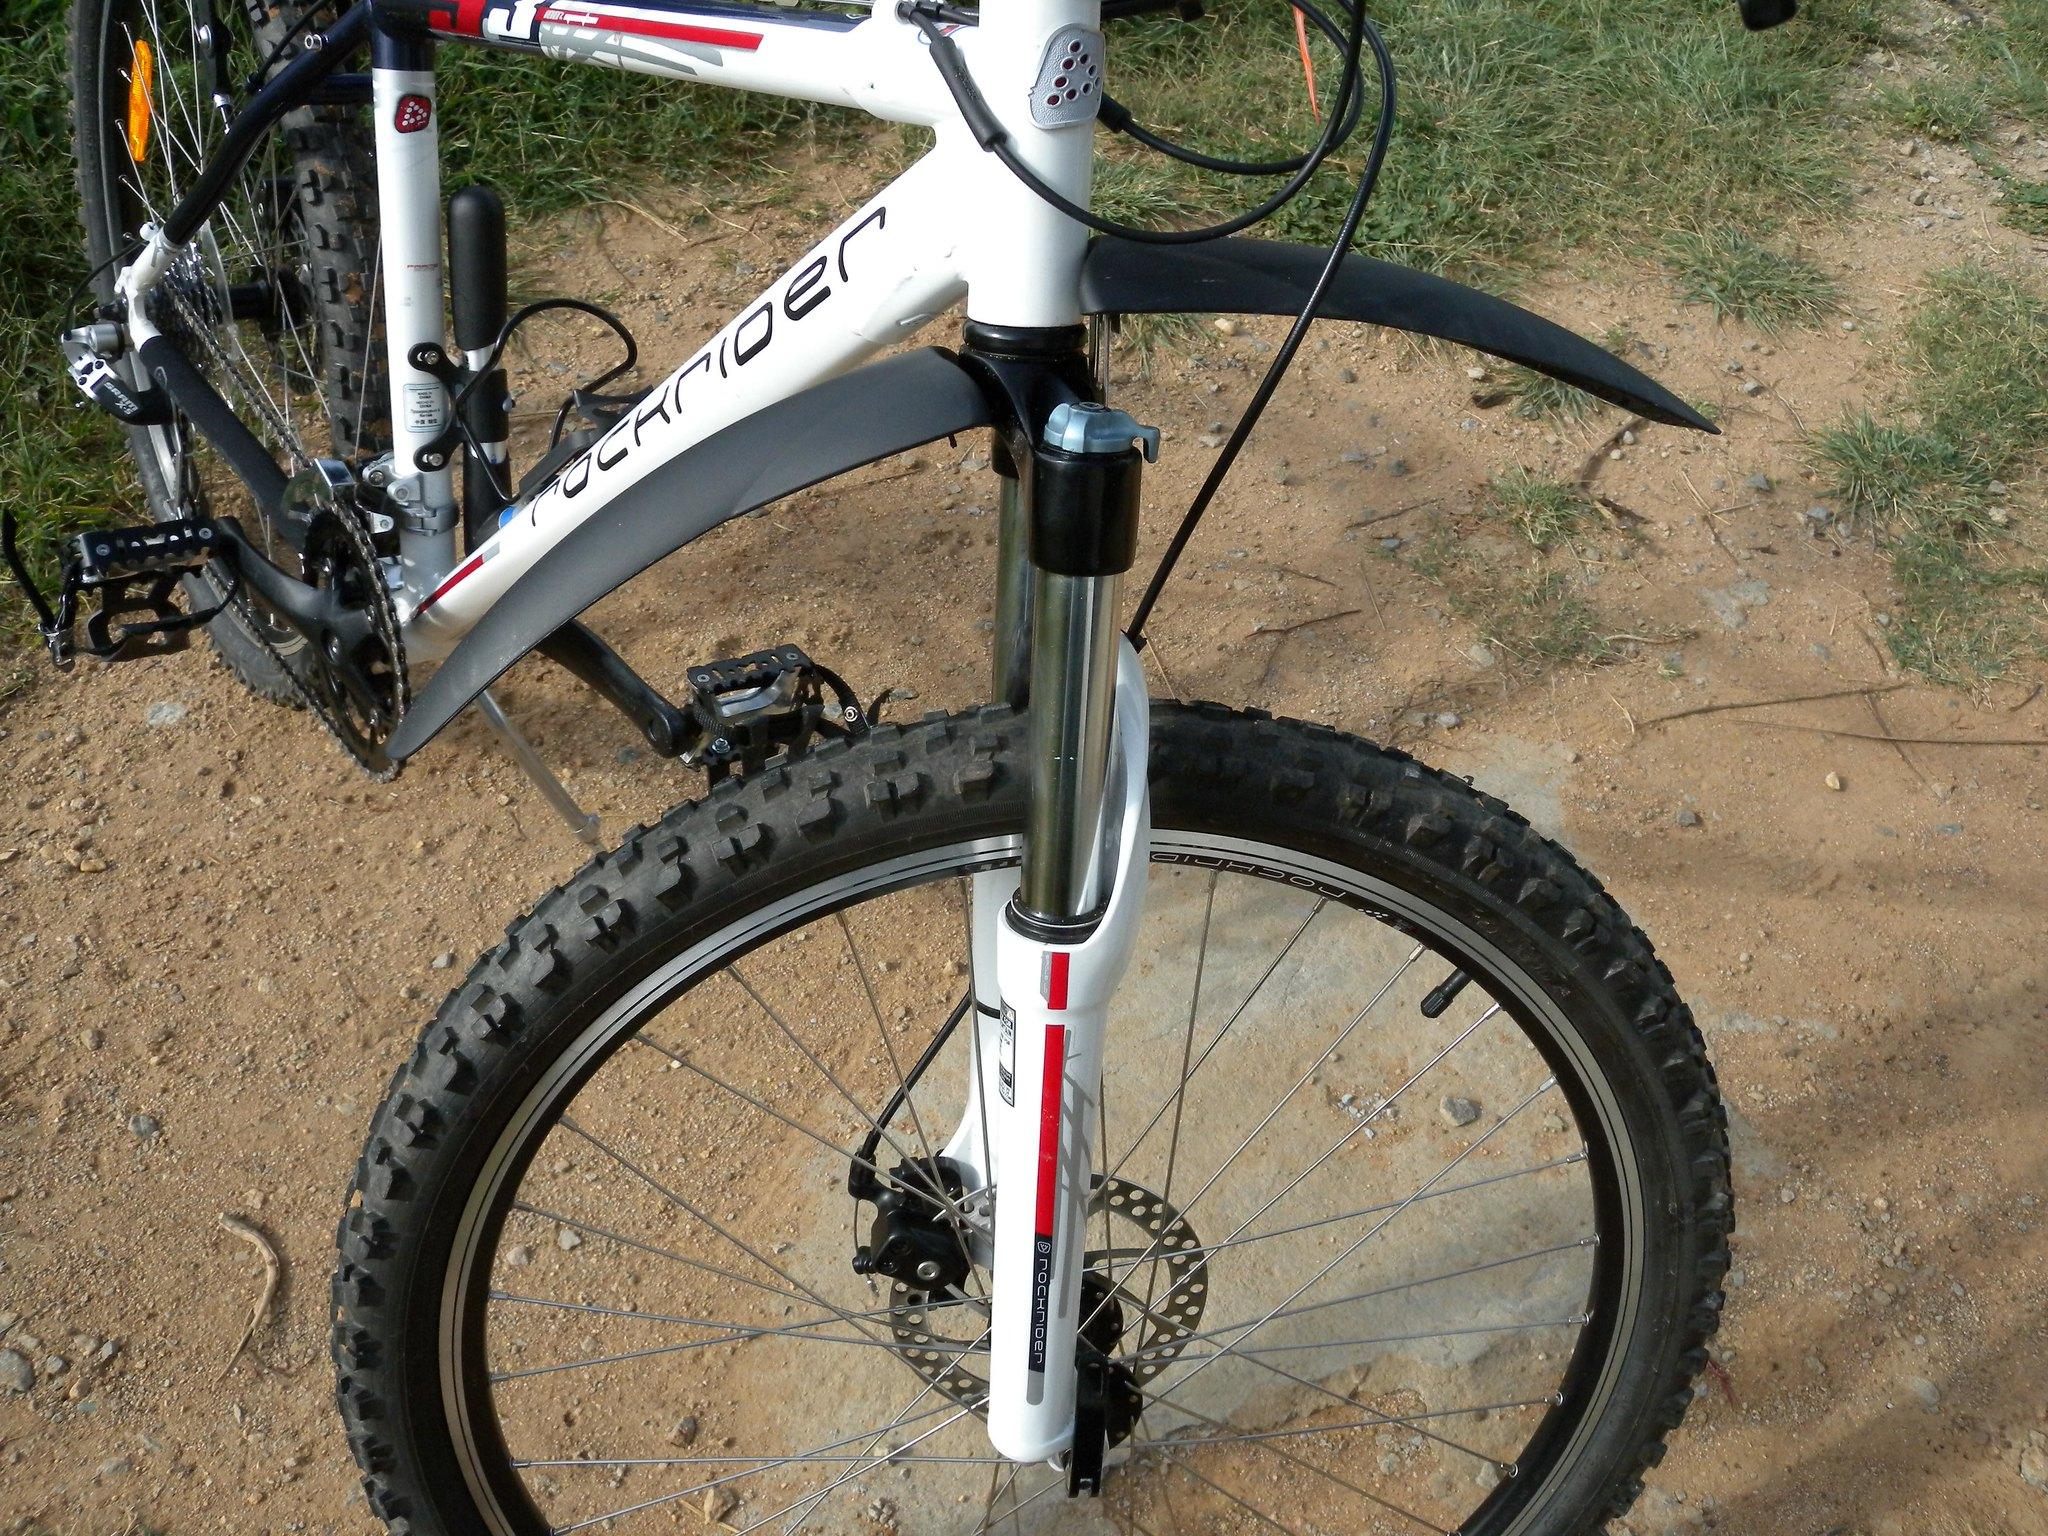 Bicicleta con guarda barros